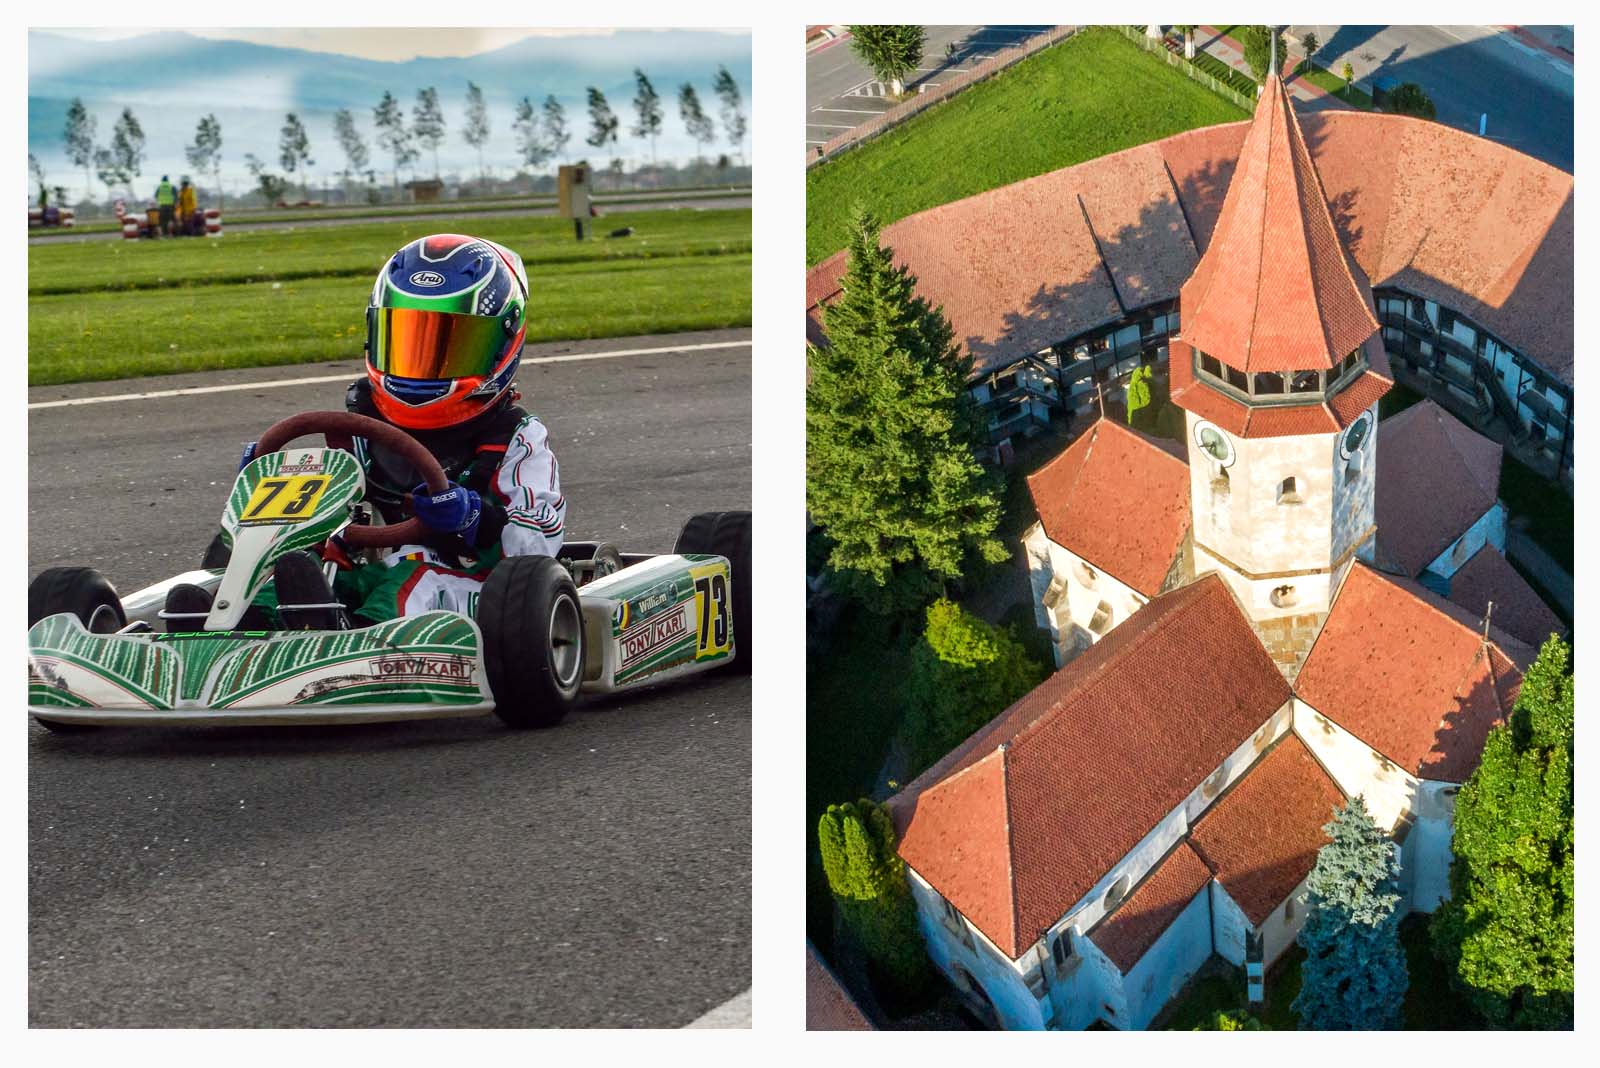 Prejmer Fortress & Karting Offer